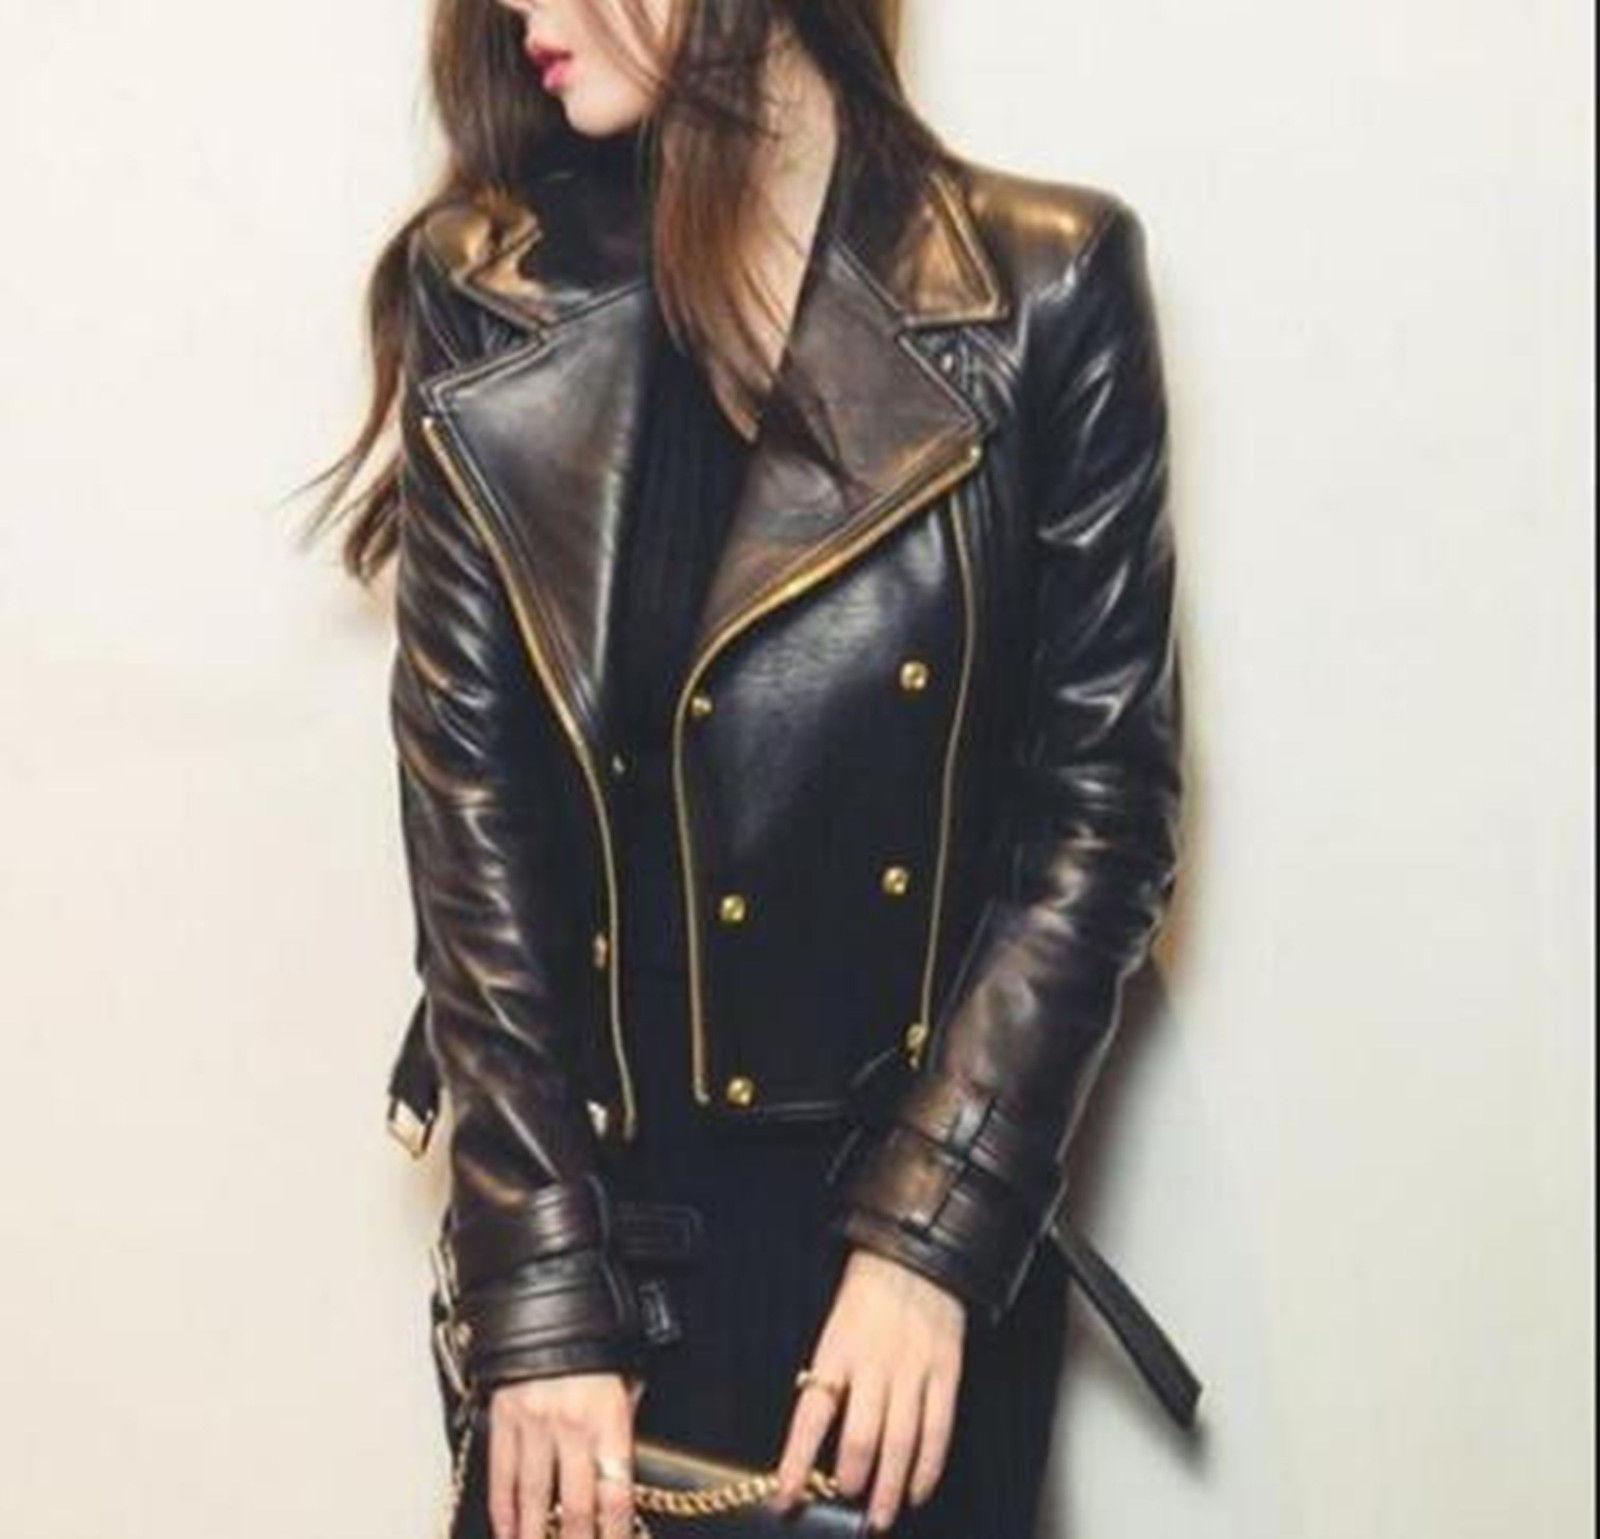 Women Stylish Lapel Short PU Leather Slim Fit Zip Motorcycle Jacket Trench Coat